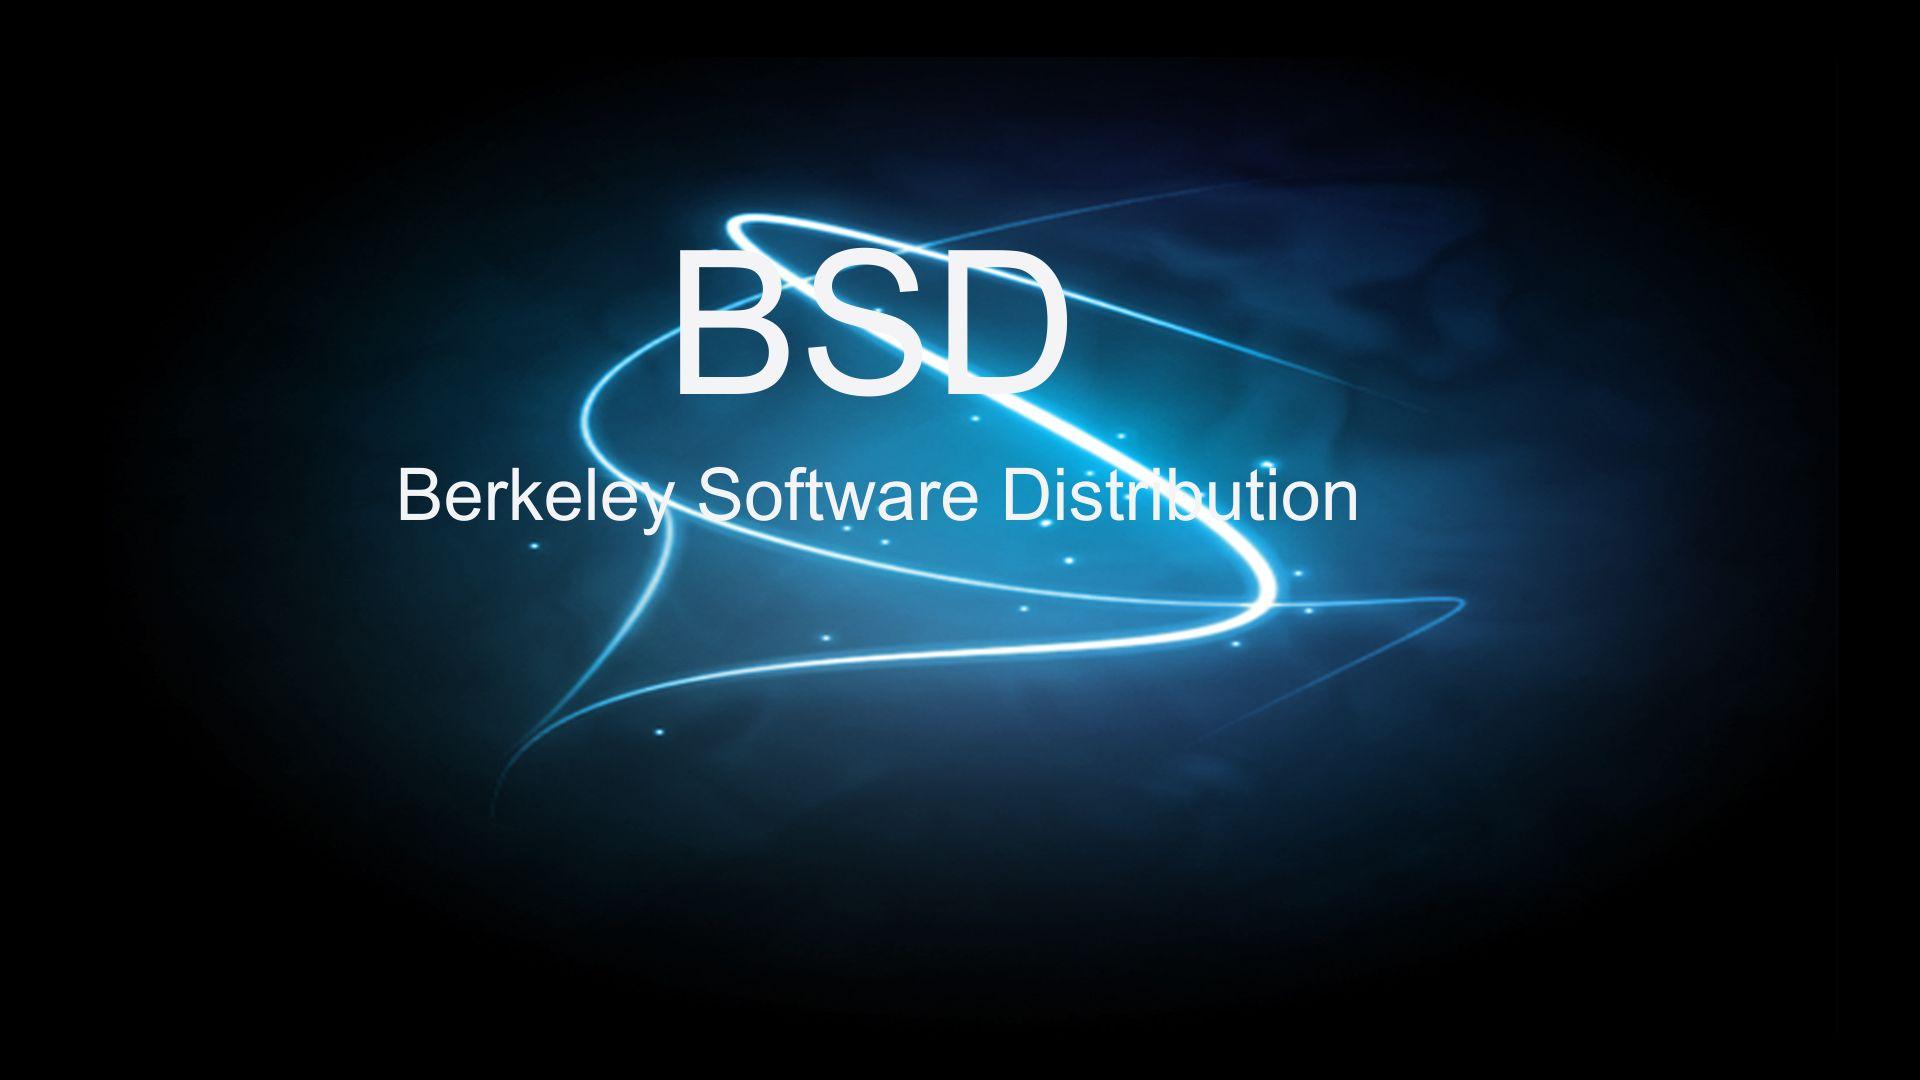 BSD Wallpaper BetoBSD 1920x1080